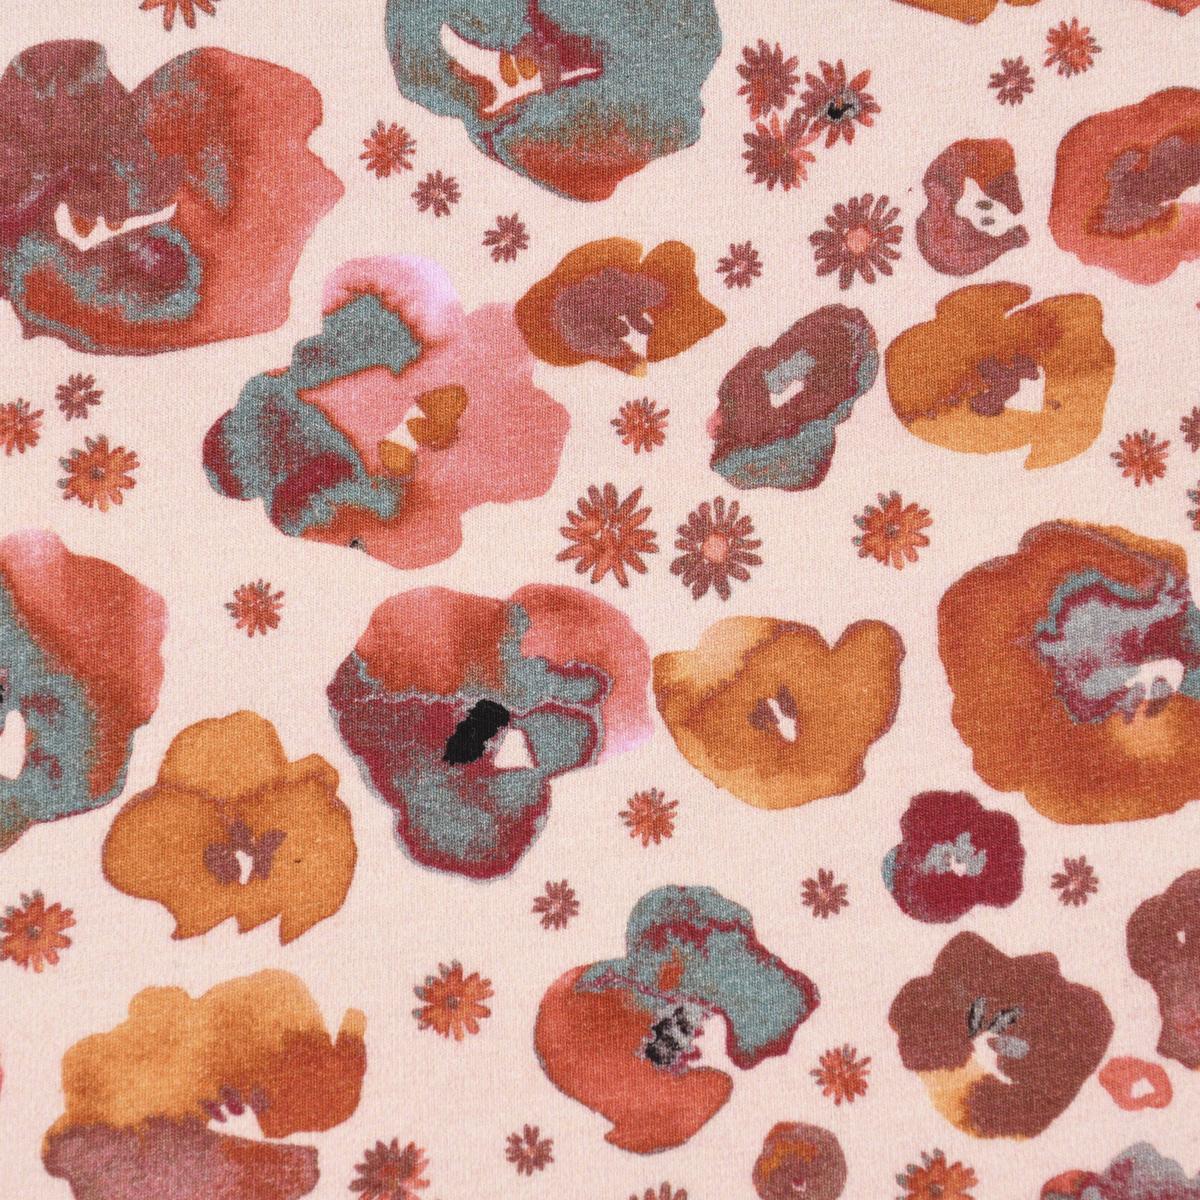 Baumwolljersey GOTS Bio Digitaldruck Blumen Mohn Aquarell apricot orange blau 1,4m Breite